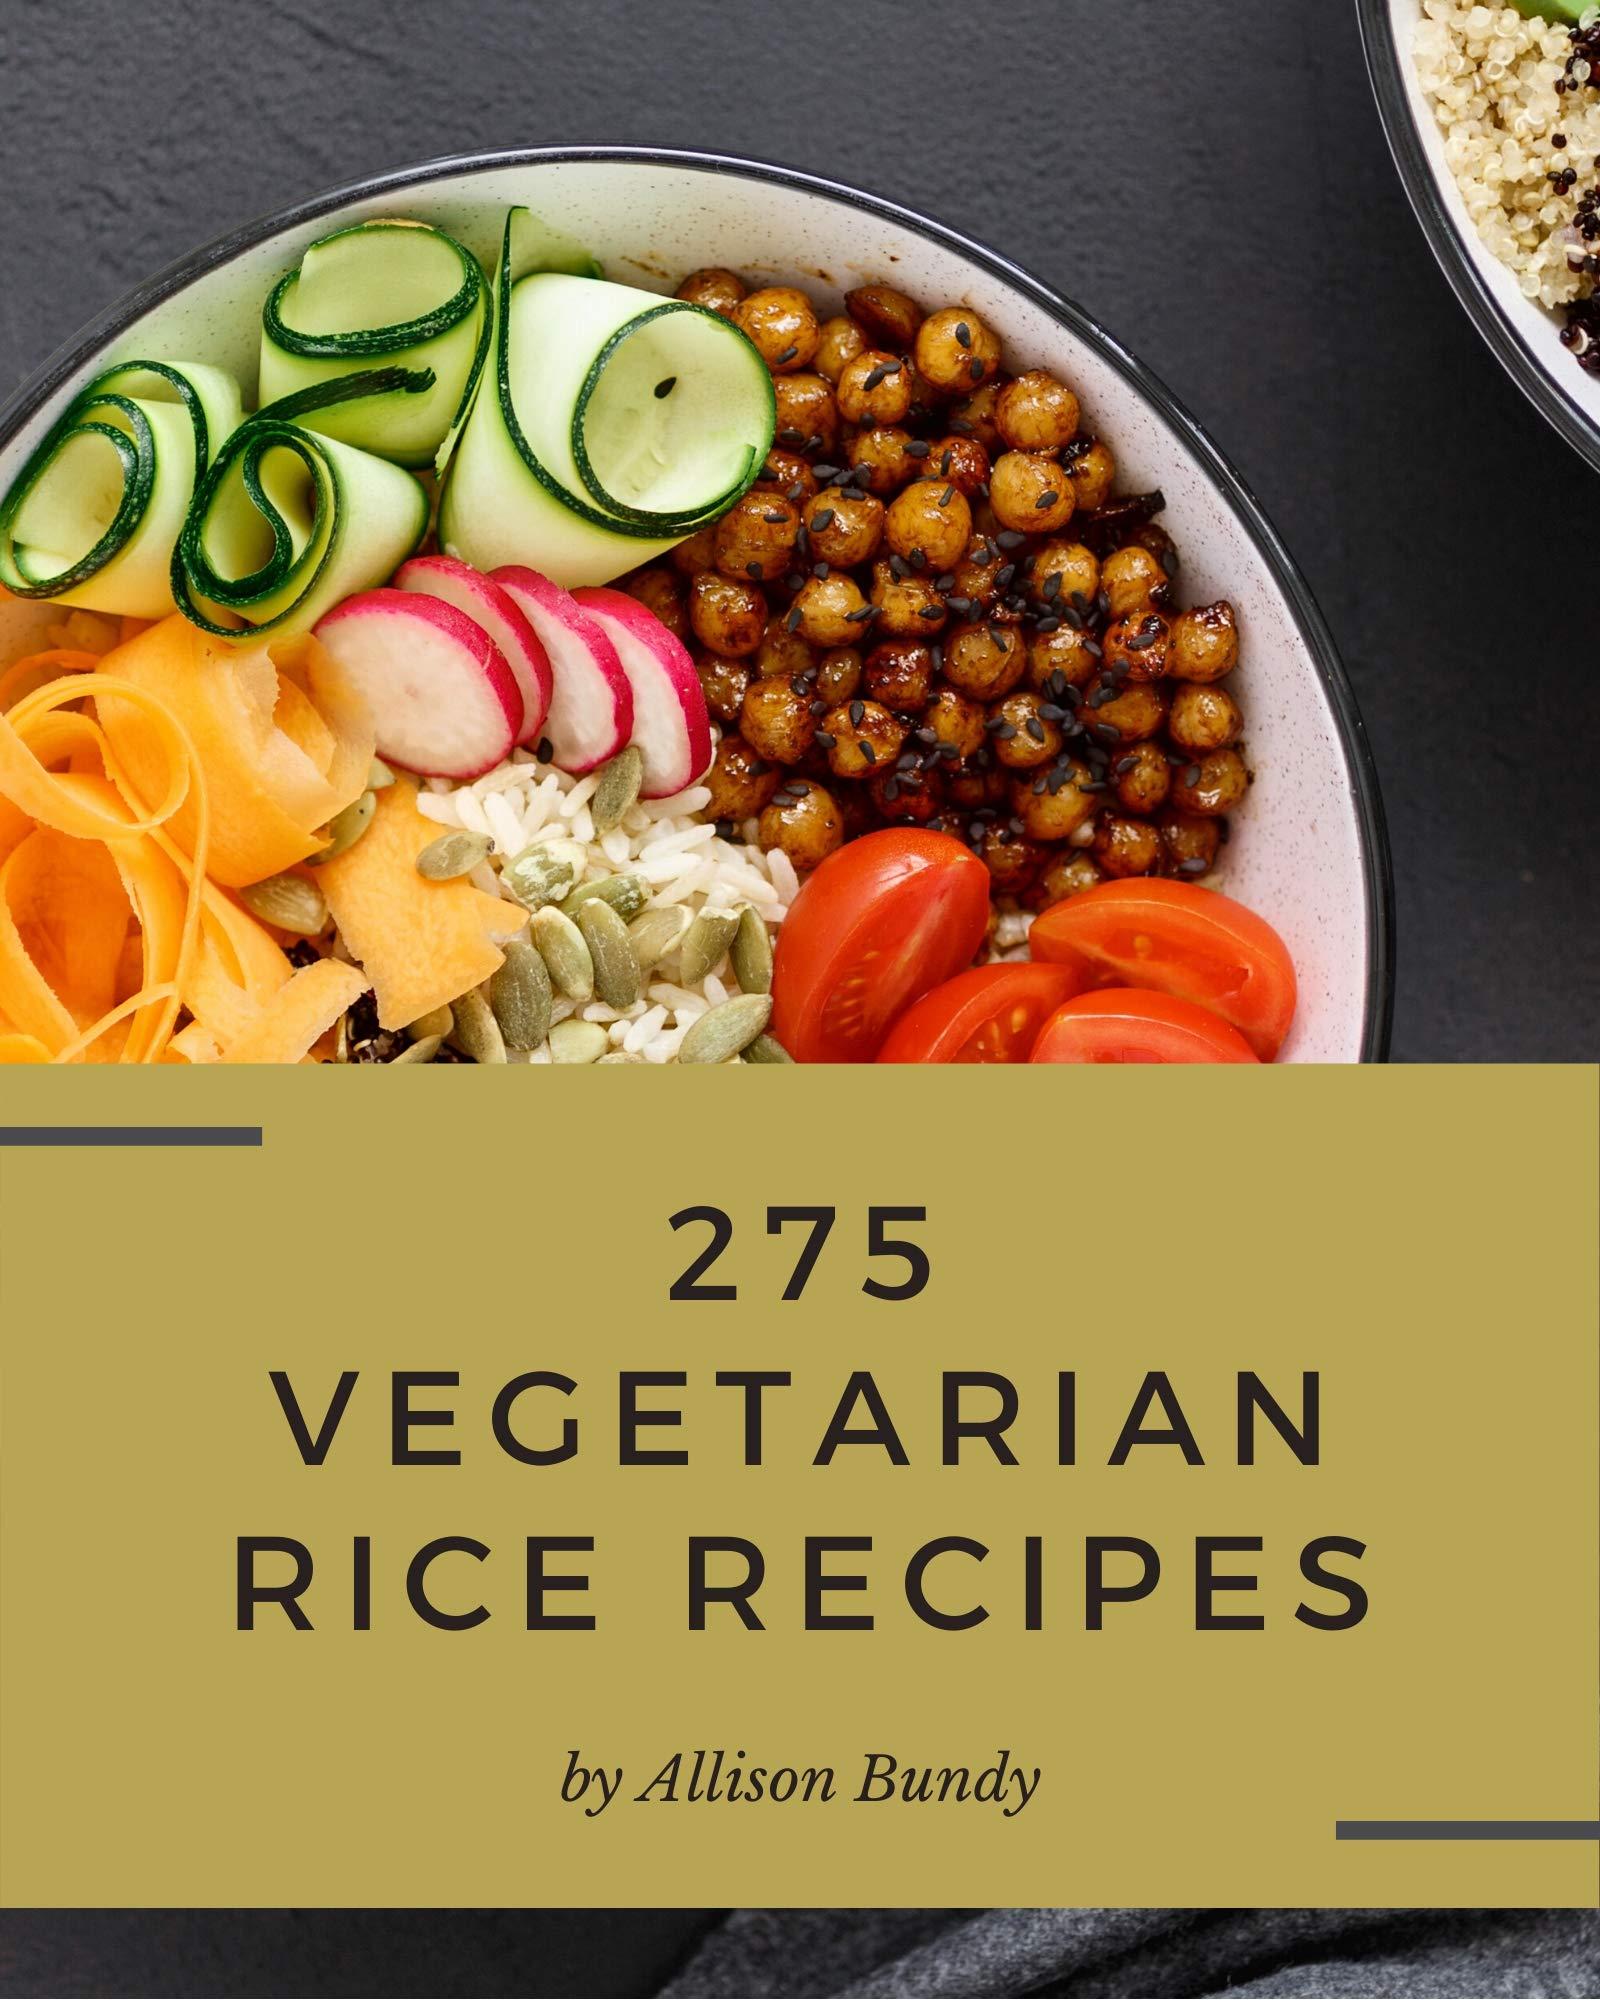 275 Vegetarian Rice Recipes: A Vegetarian Rice Cookbook You Will Love